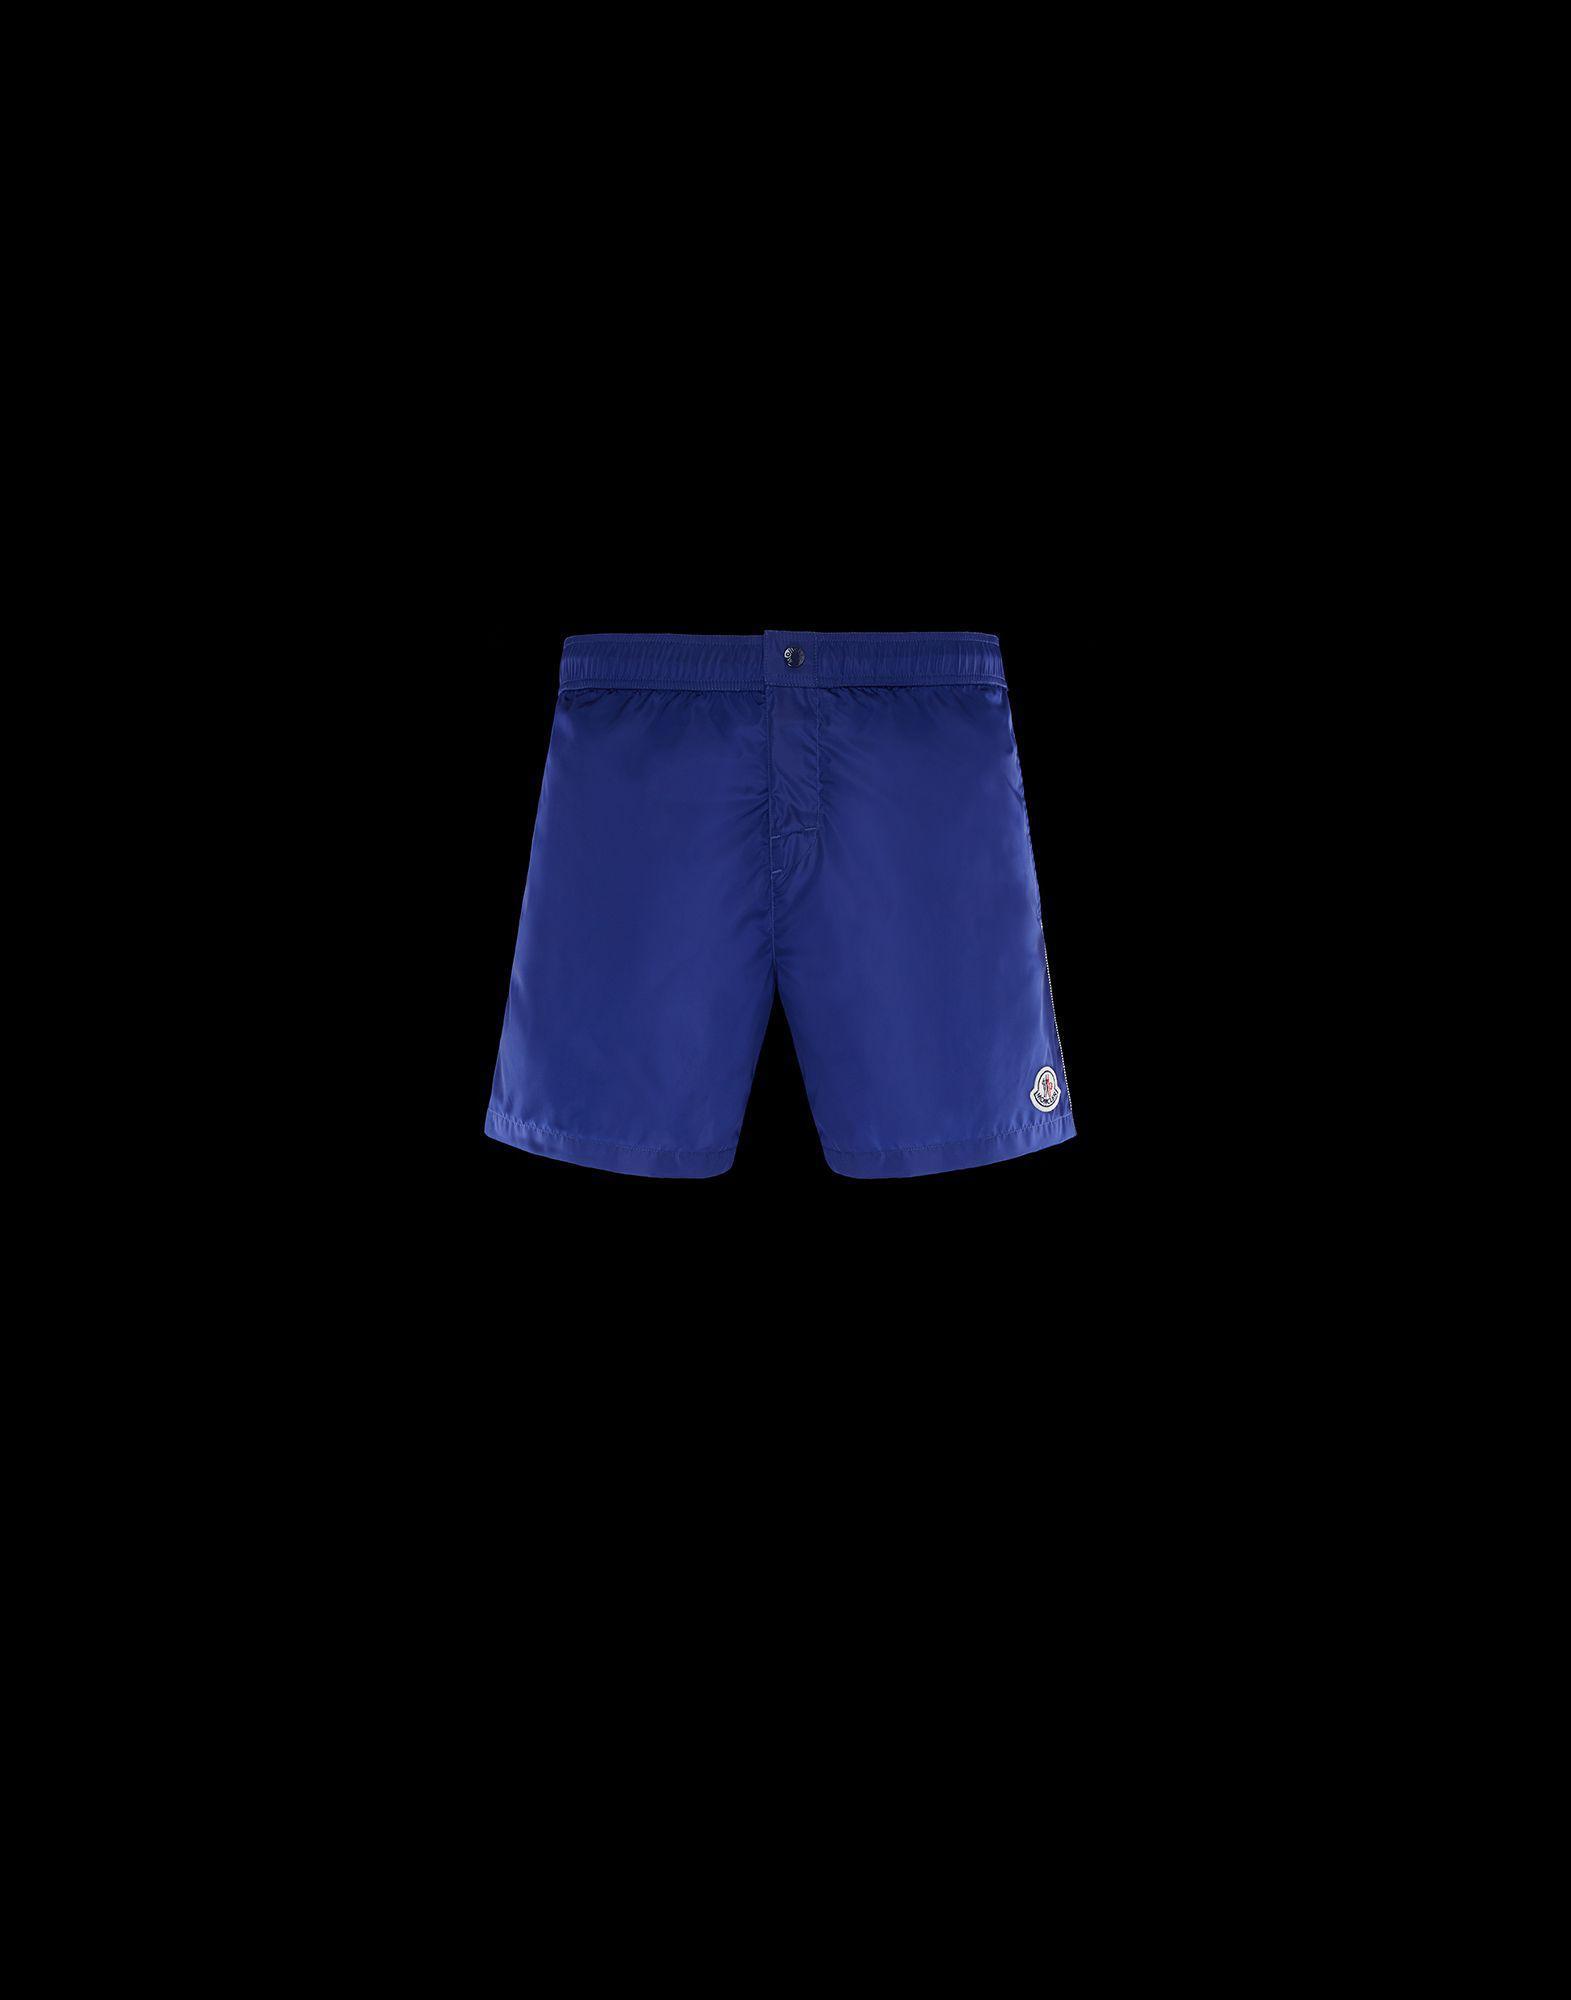 28a5d665d0b3 Moncler Boxer Shorts in Blue for Men - Lyst